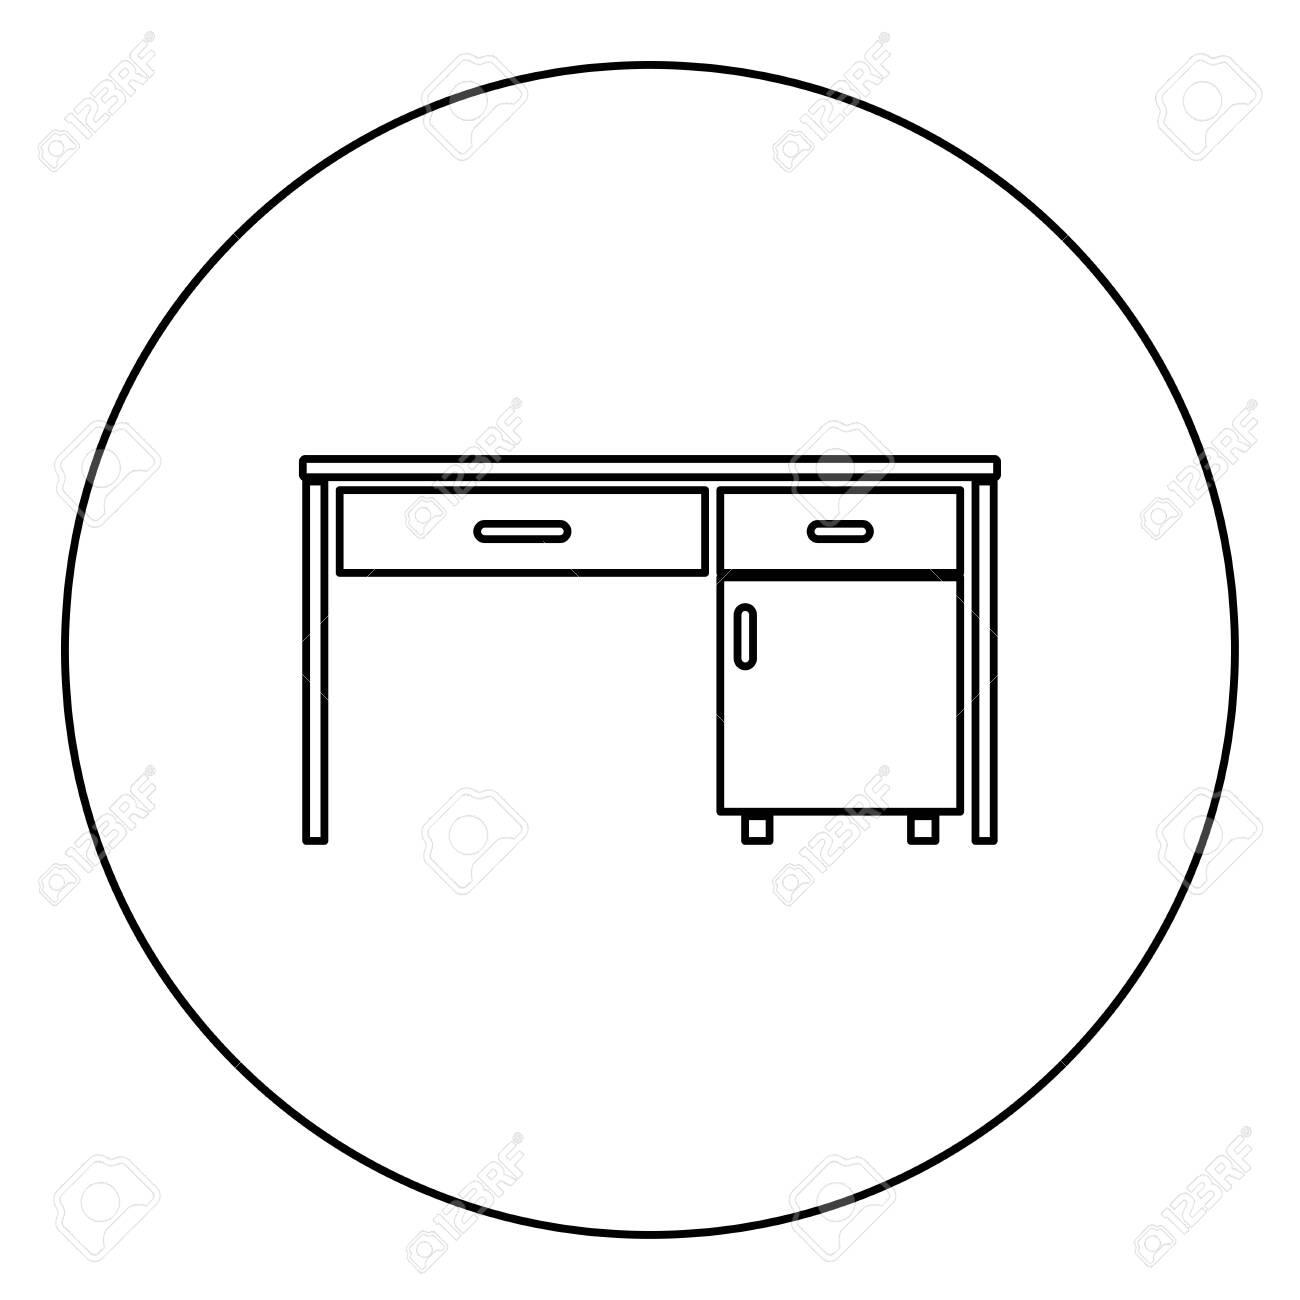 Desk Business Office Desk Written Table Workplace In Office Concept